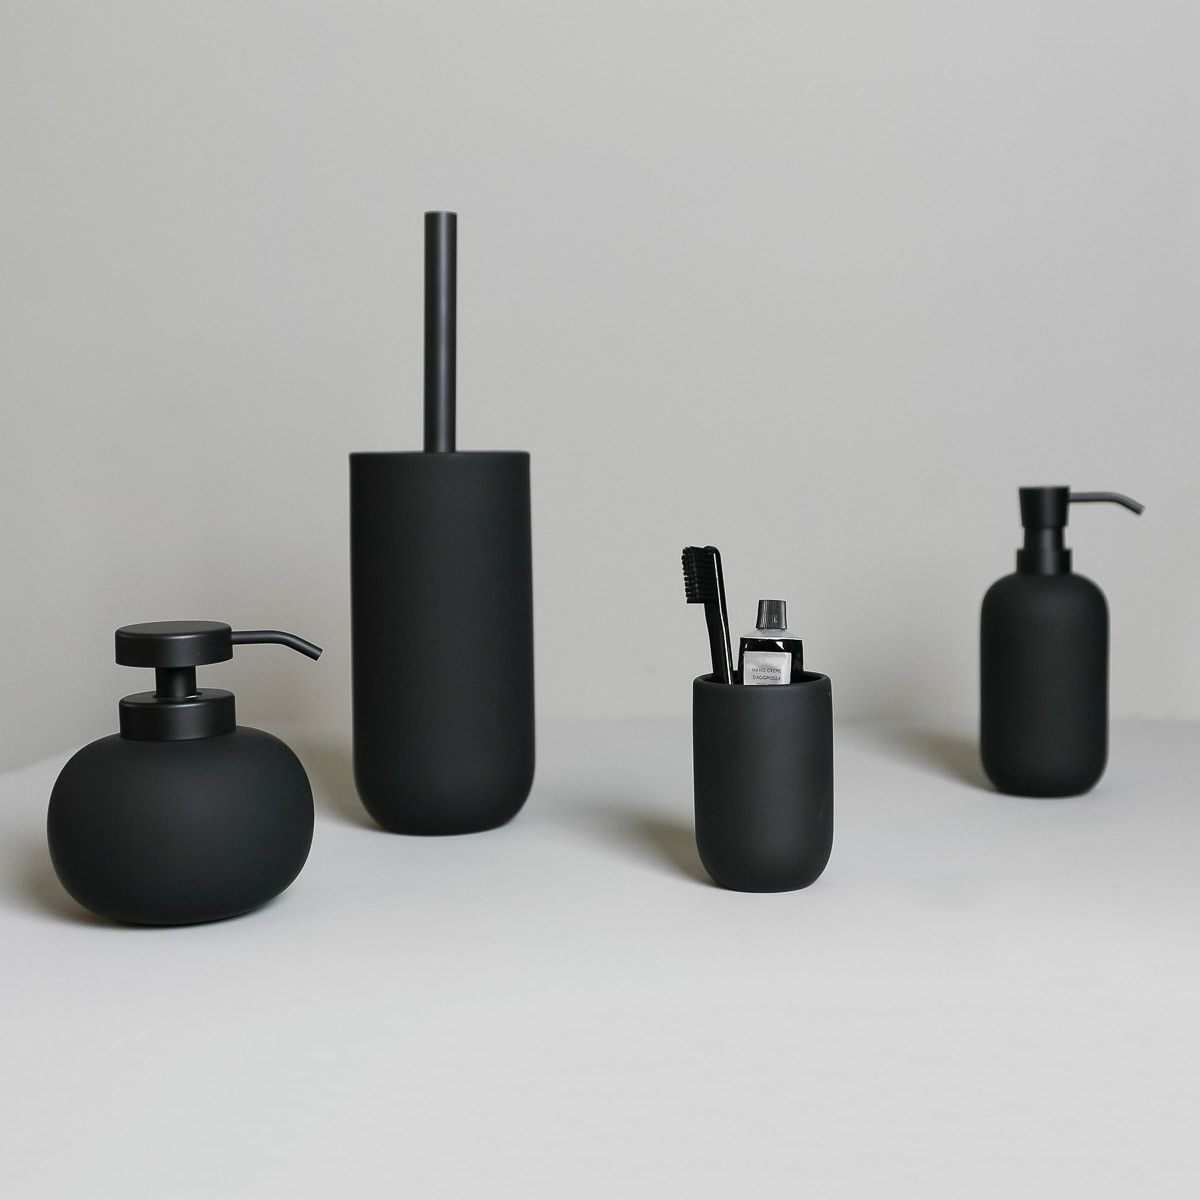 Mette Ditmer Lotus Toilet Brush Black